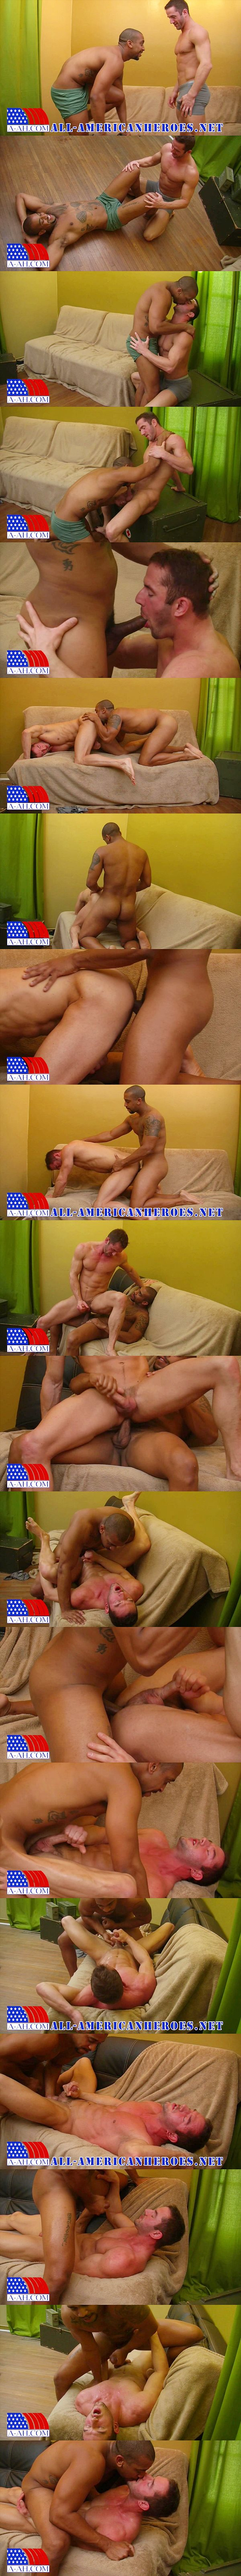 Lieutenant Quinton barebacks Lieutenant Zach at All-americanheroes 02